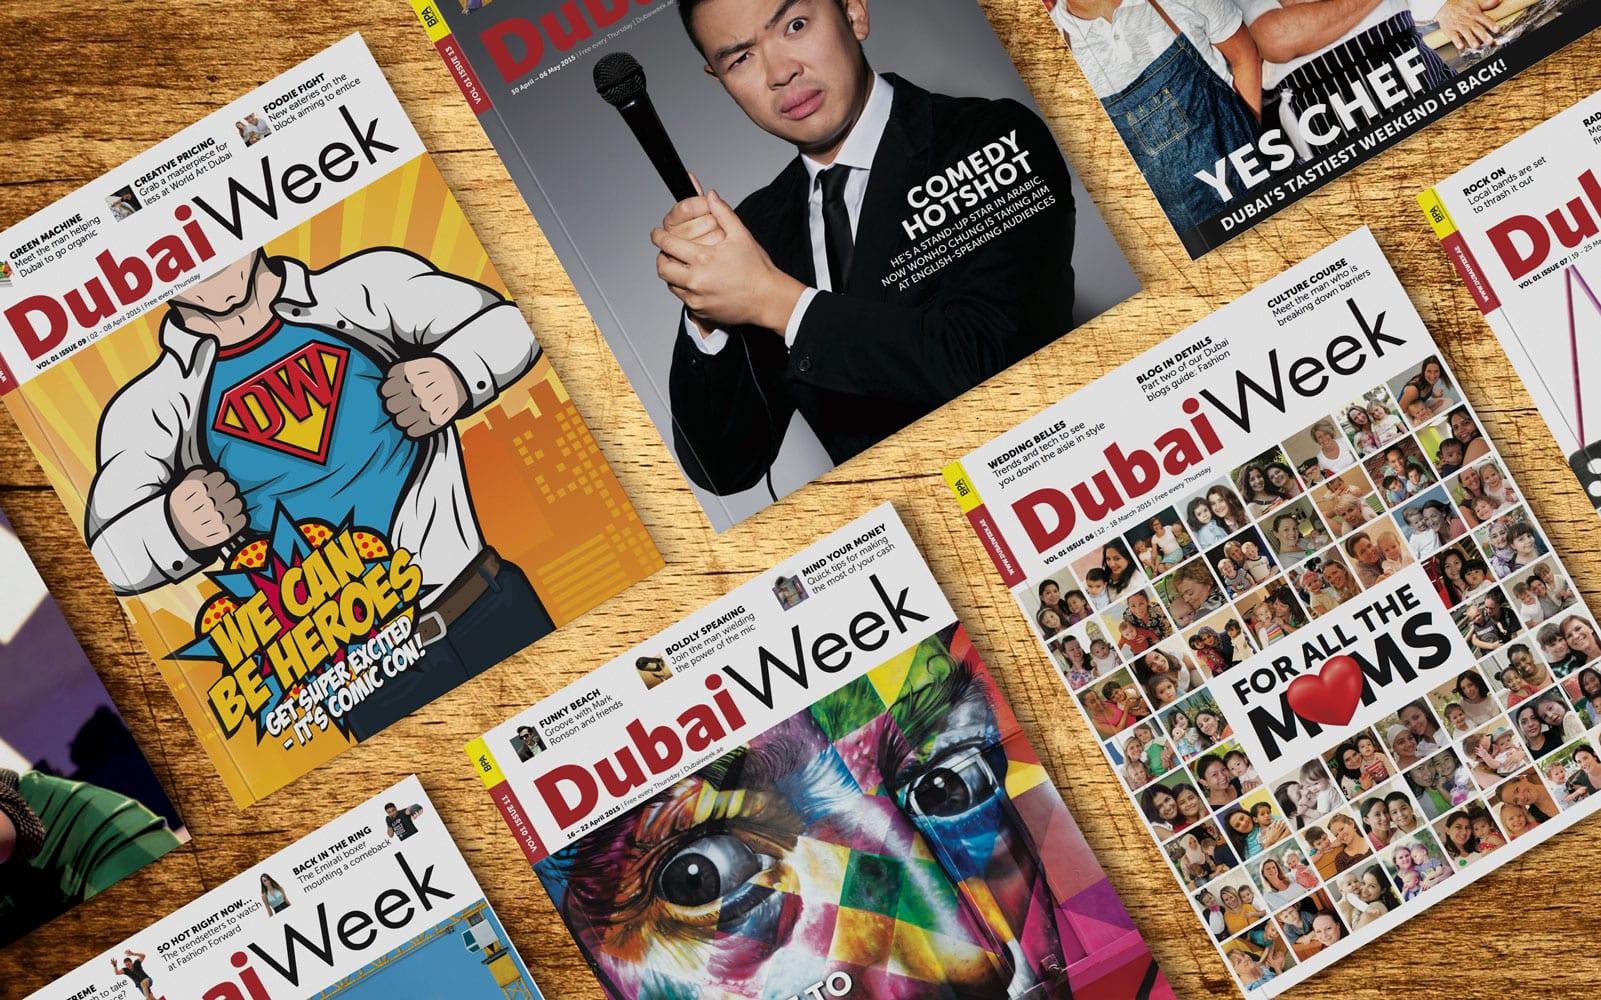 Dubai Week Magazine